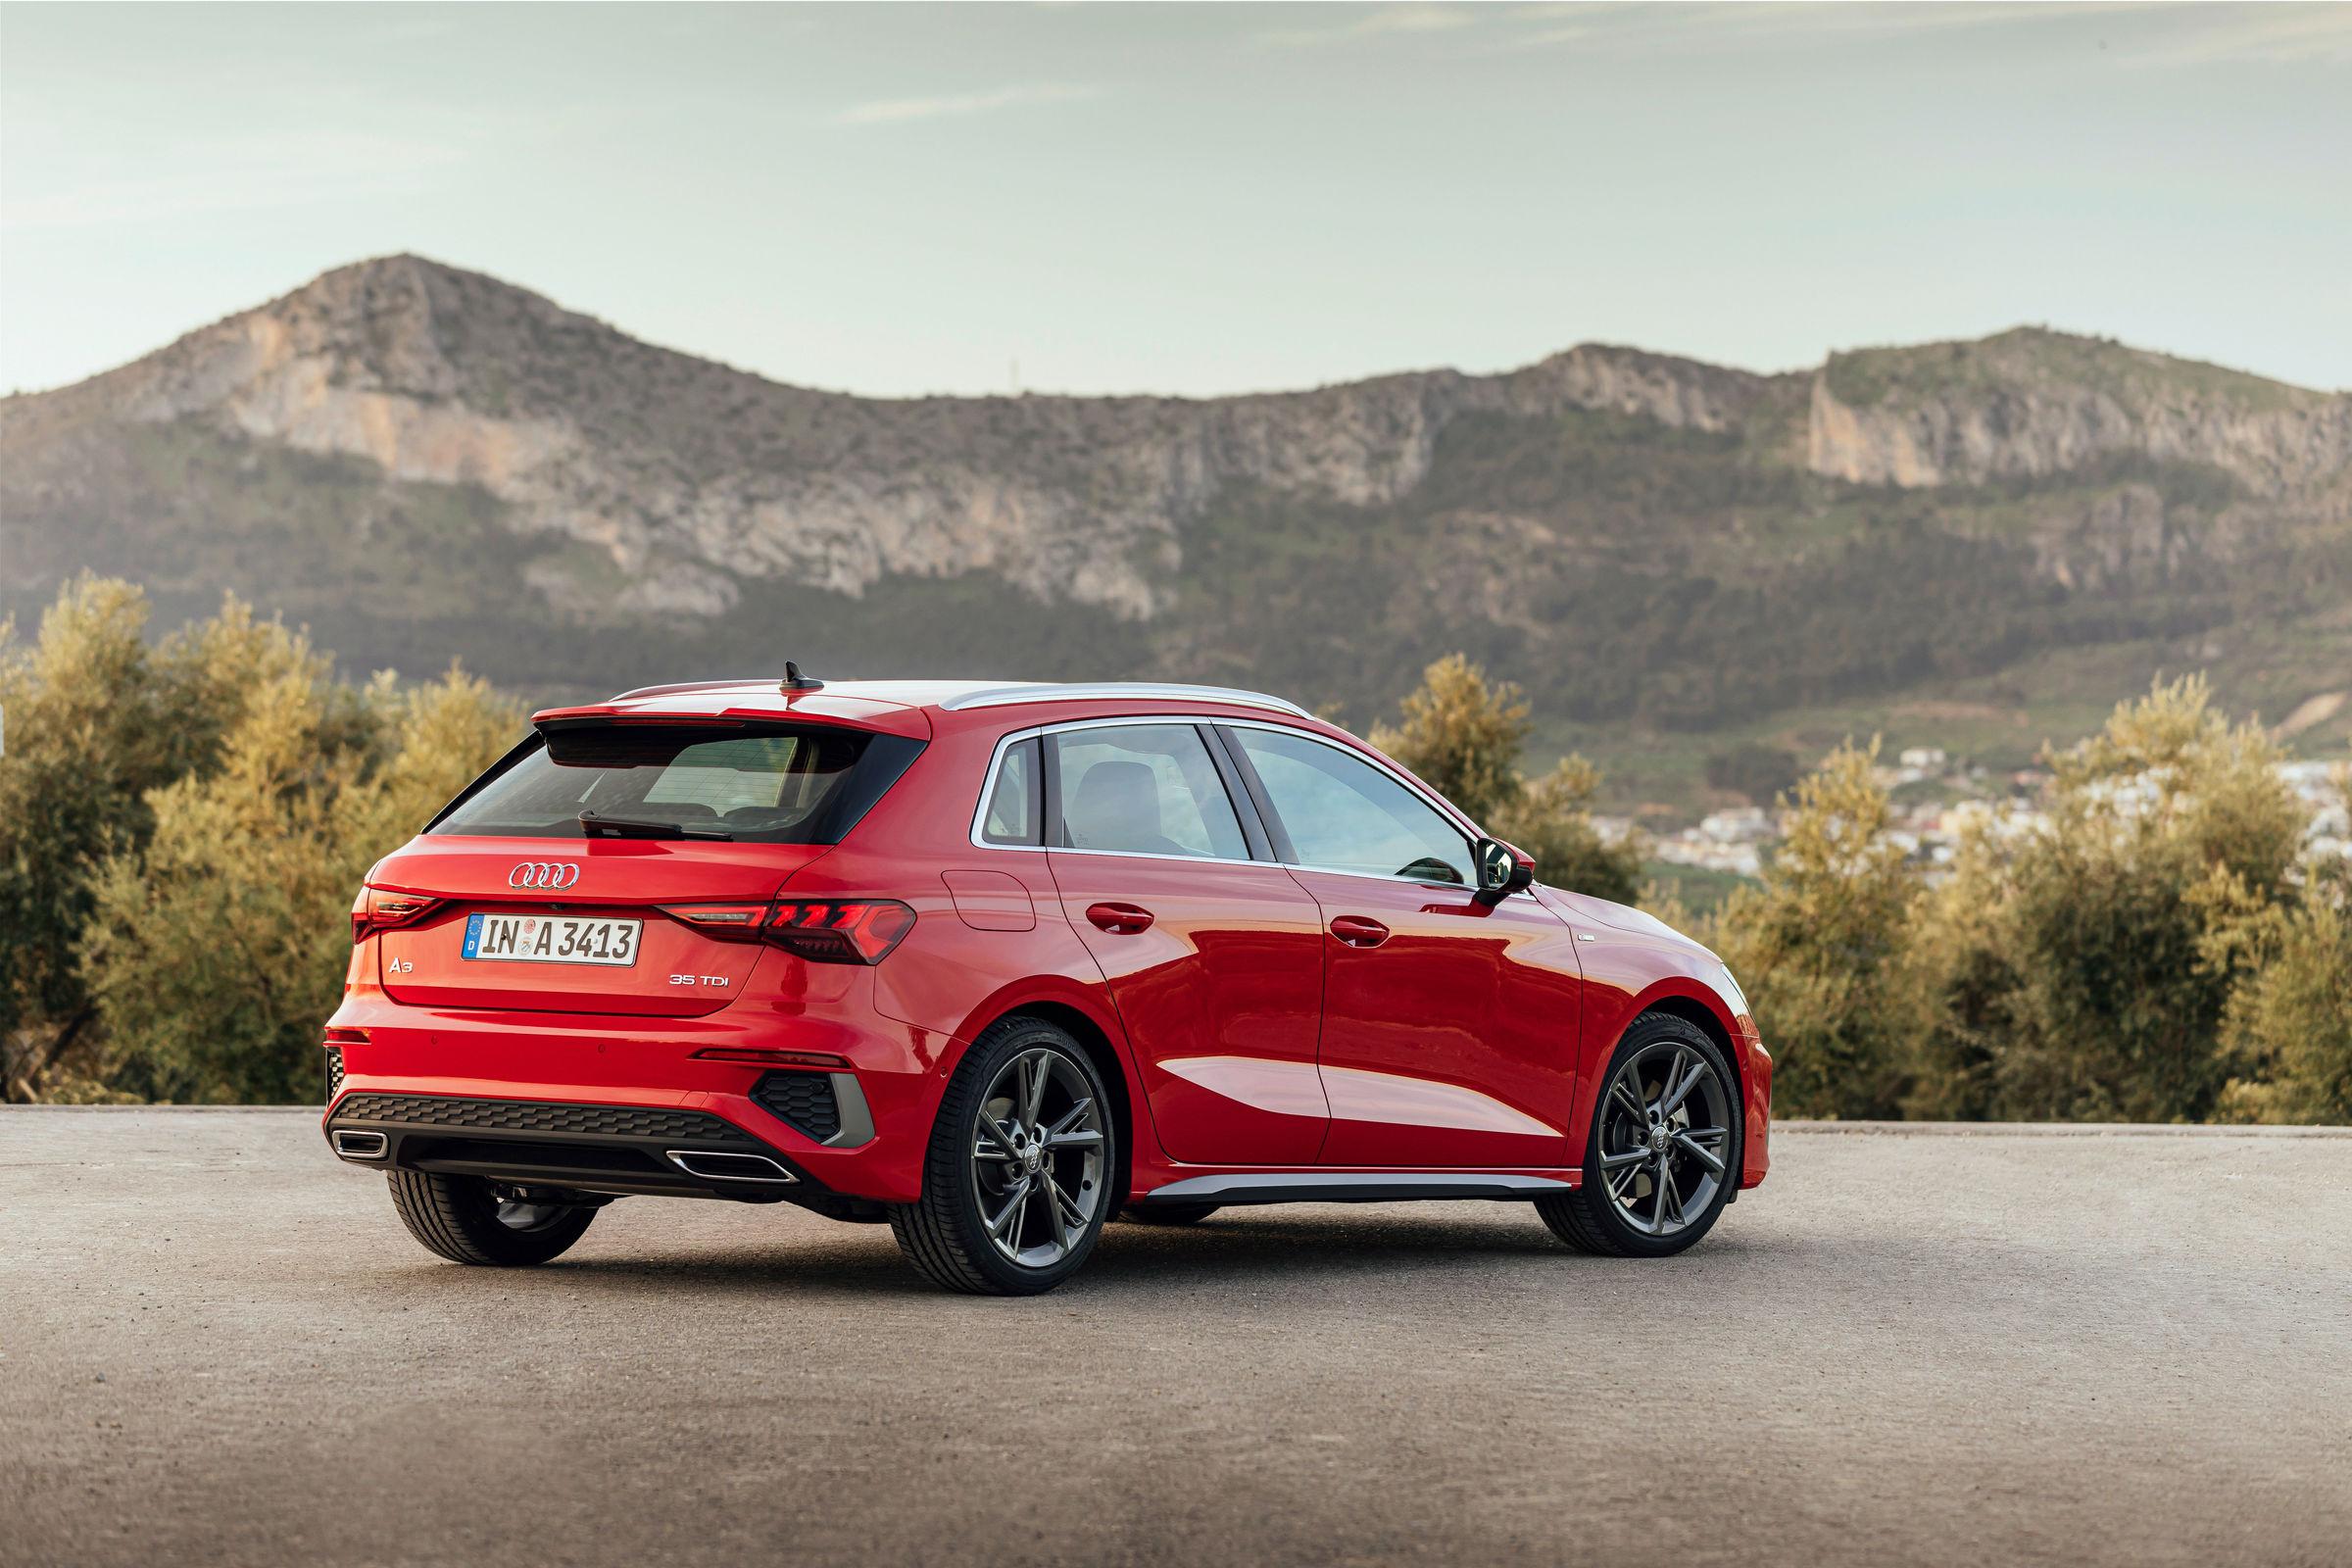 Success model 4.0: the new Audi A3 Sportback - Image 3